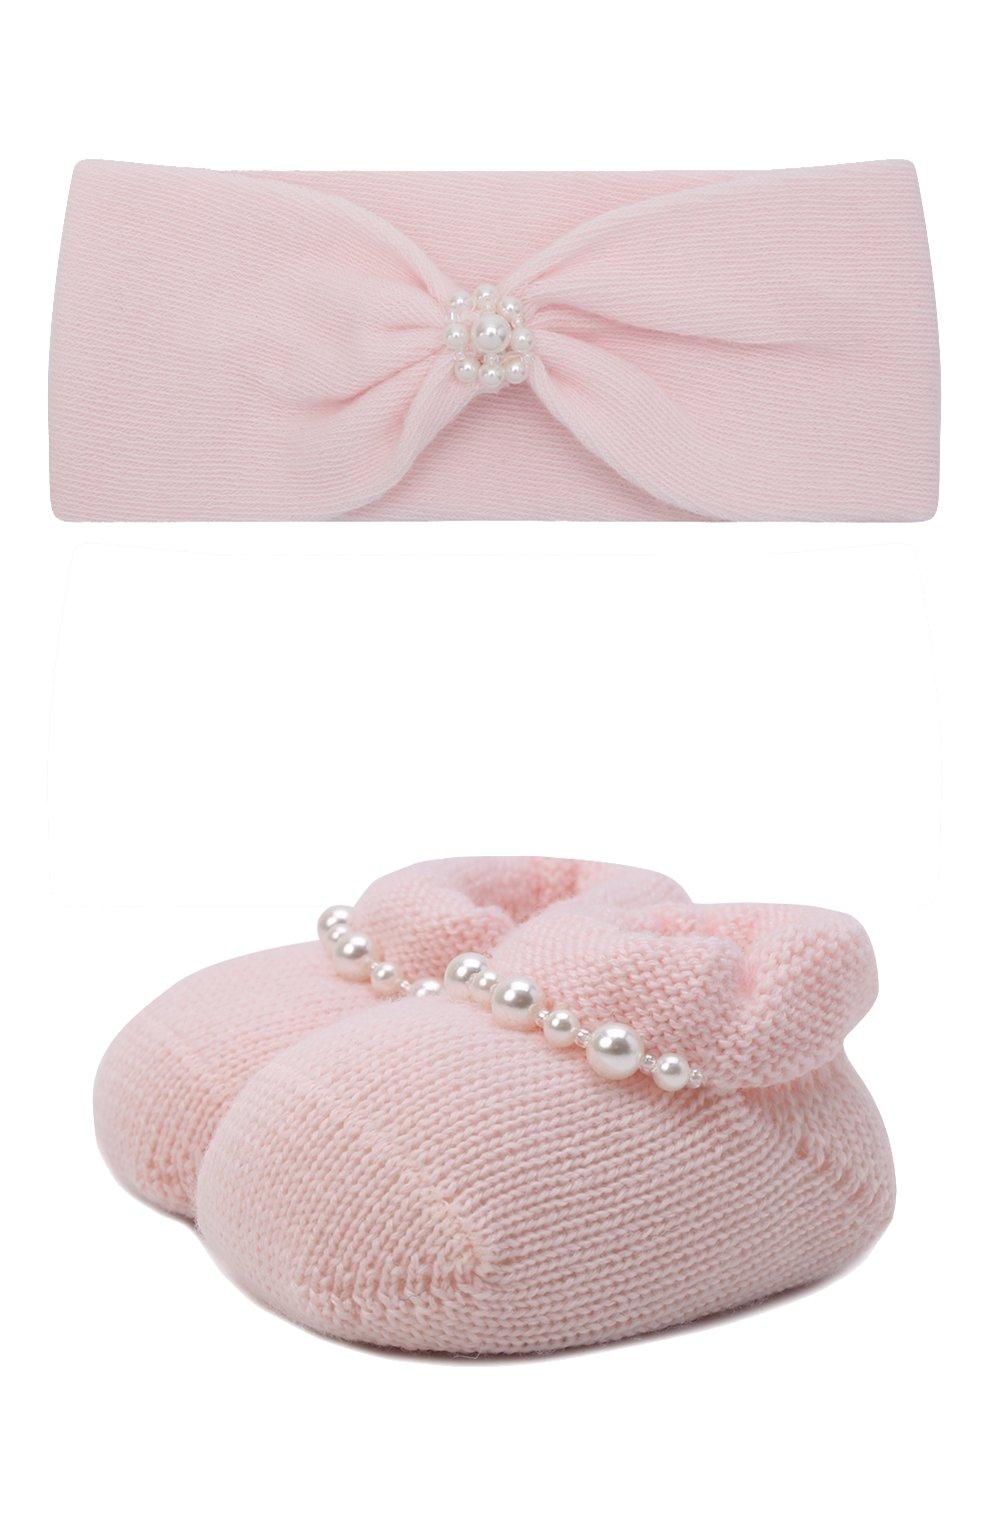 Детские комплект из пинеток и повязки на голову LA PERLA розового цвета, арт. 48532 | Фото 1